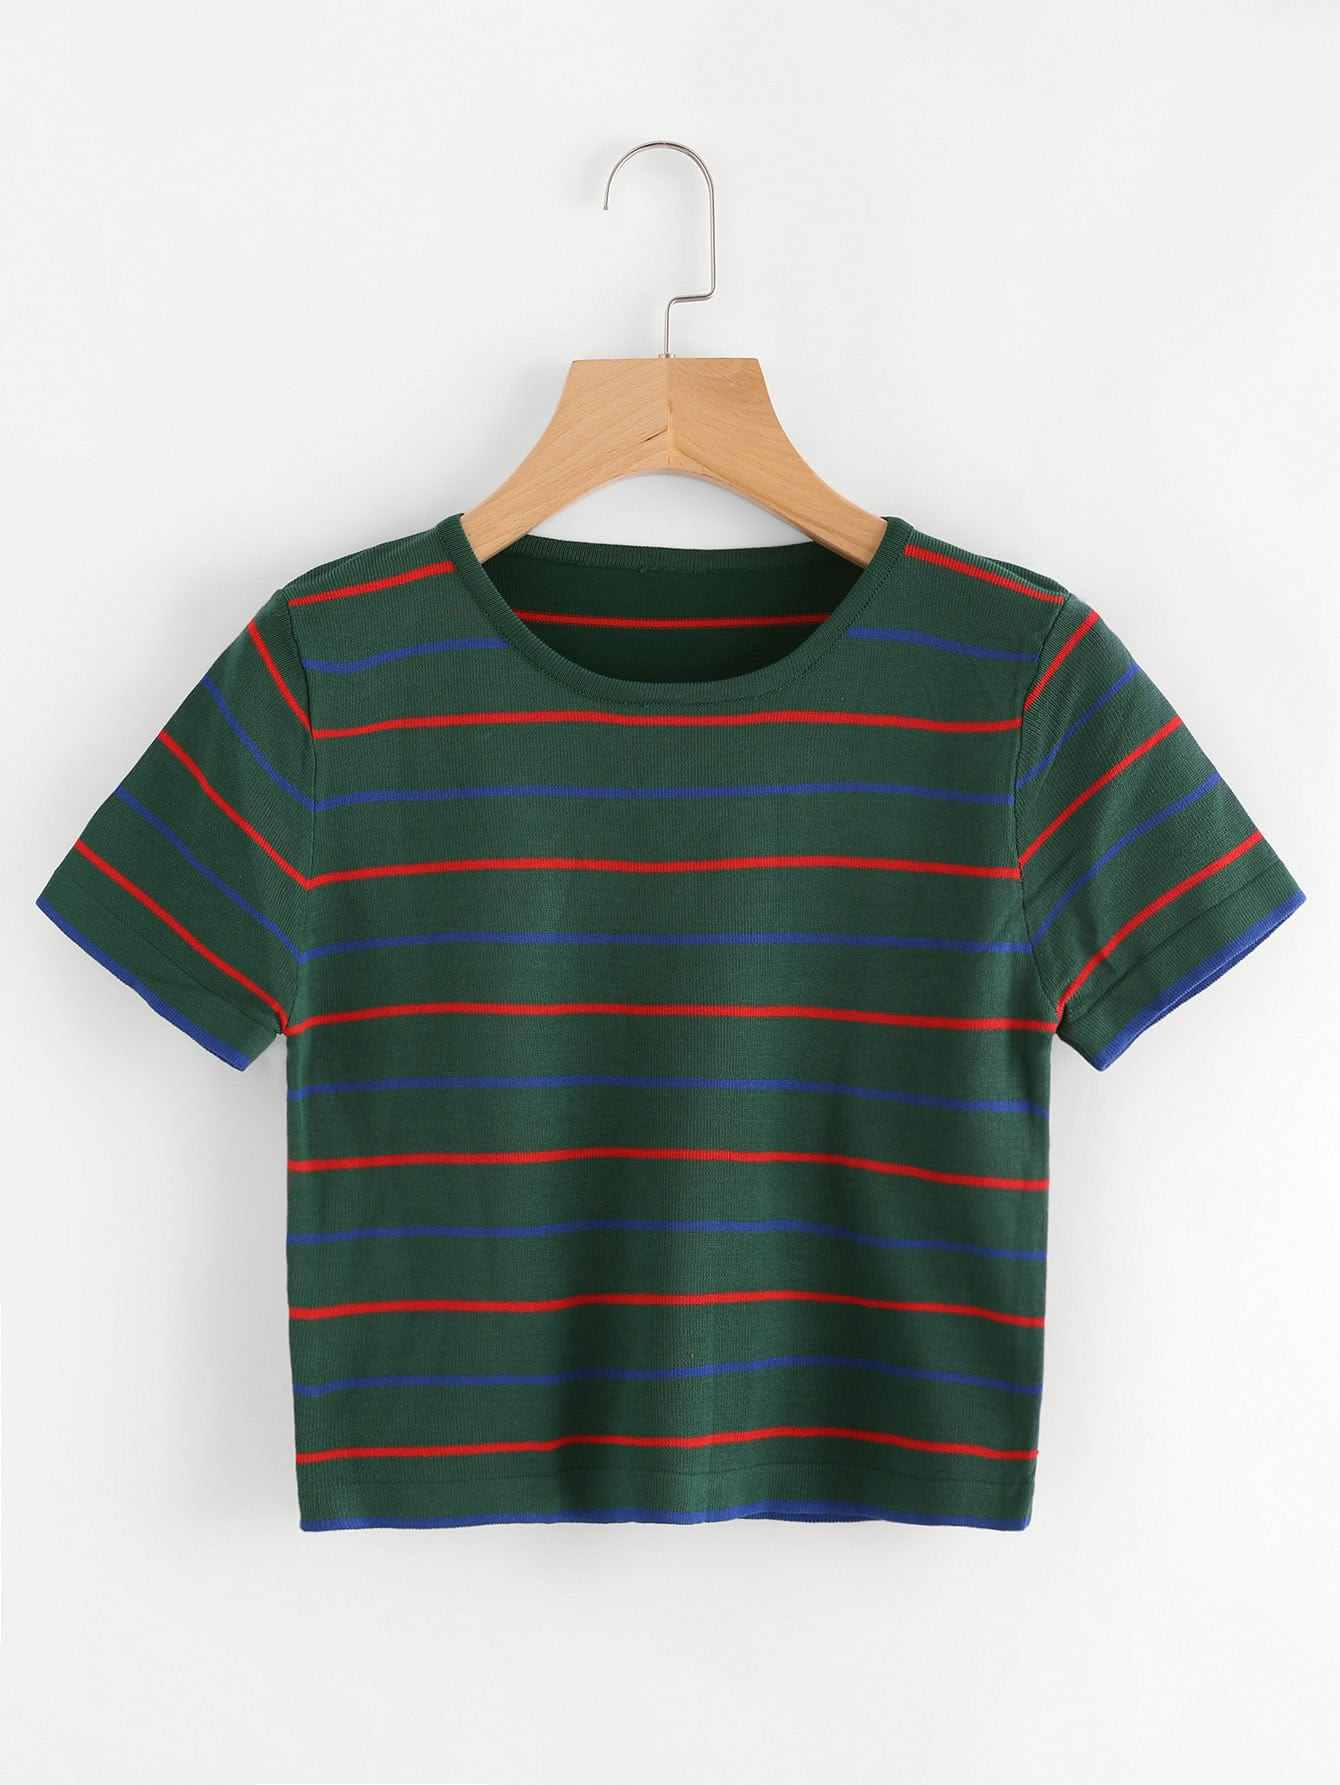 camiseta corta de rayas - shein espa09a